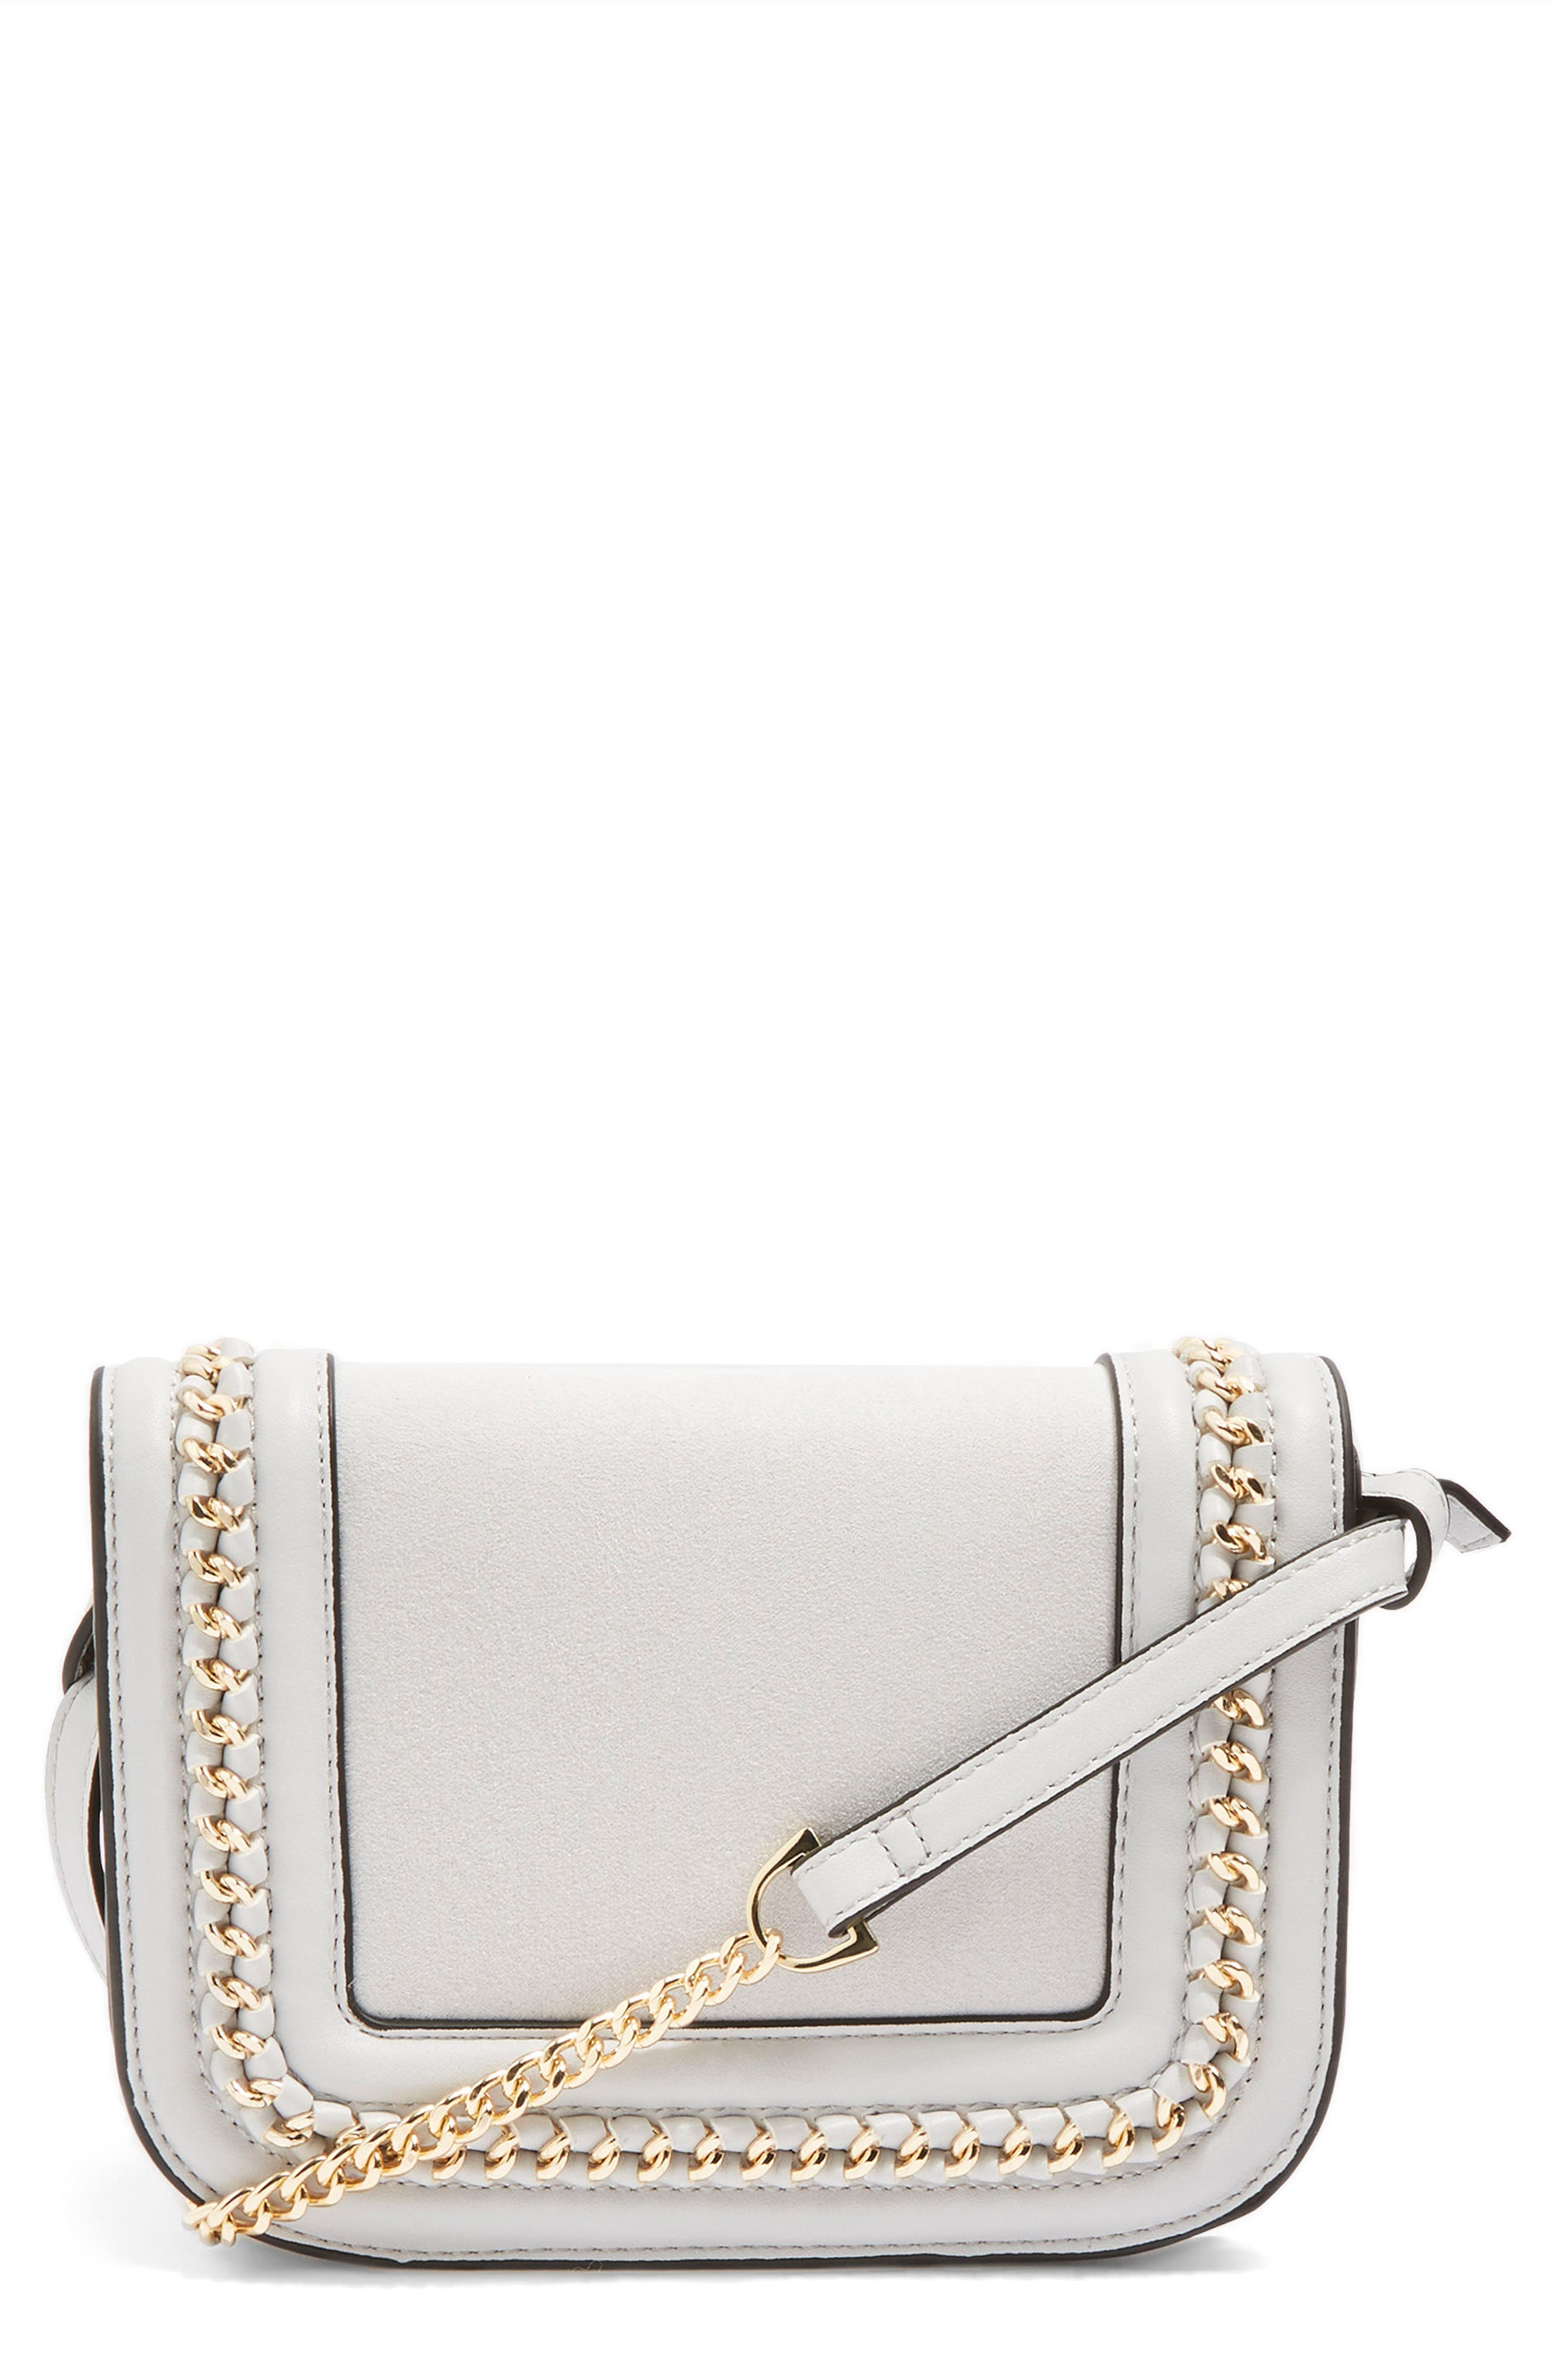 Alternate Image 1 Selected - Topshop Carmel Chain Flap Crossbody Bag